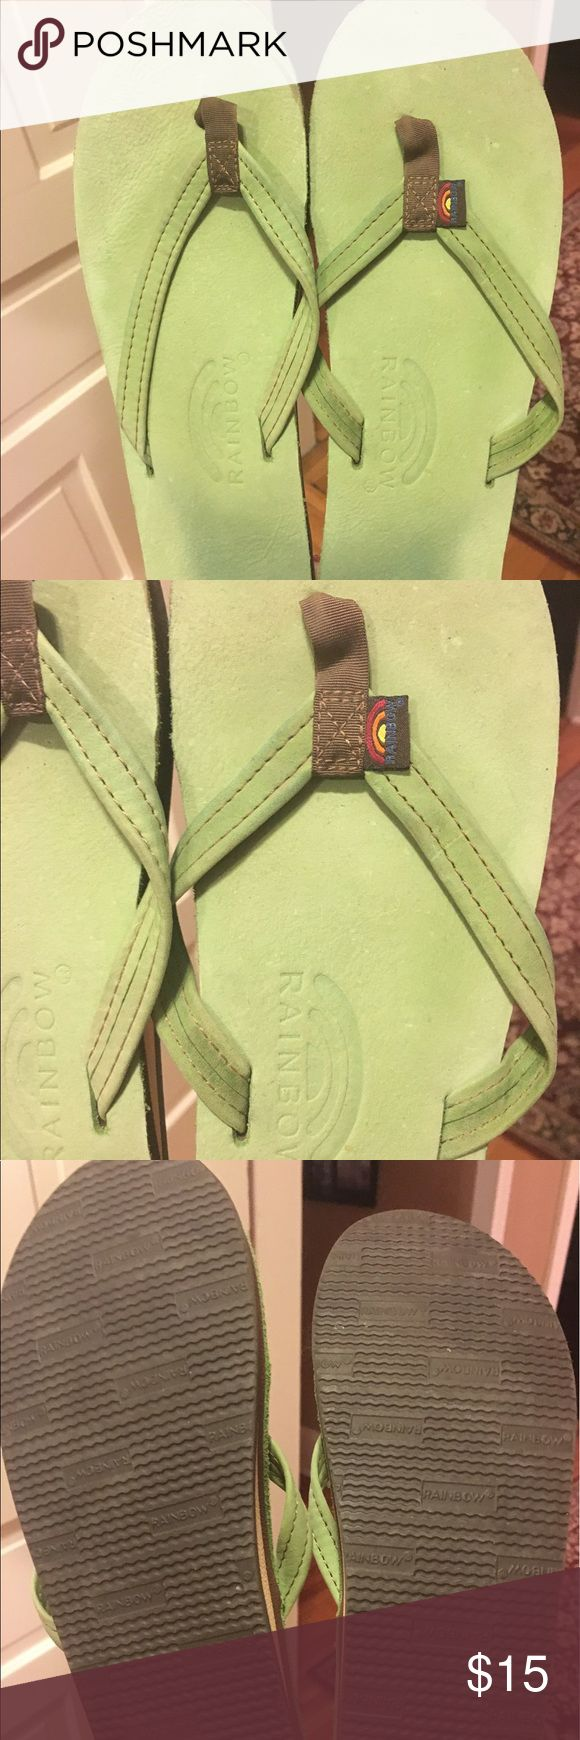 Women's Rainbow Lime Green Flip Flops L/XL Worn a few times. Lime green leather rainbow sandals. Fits women 8-10 Rainbow Shoes Sandals